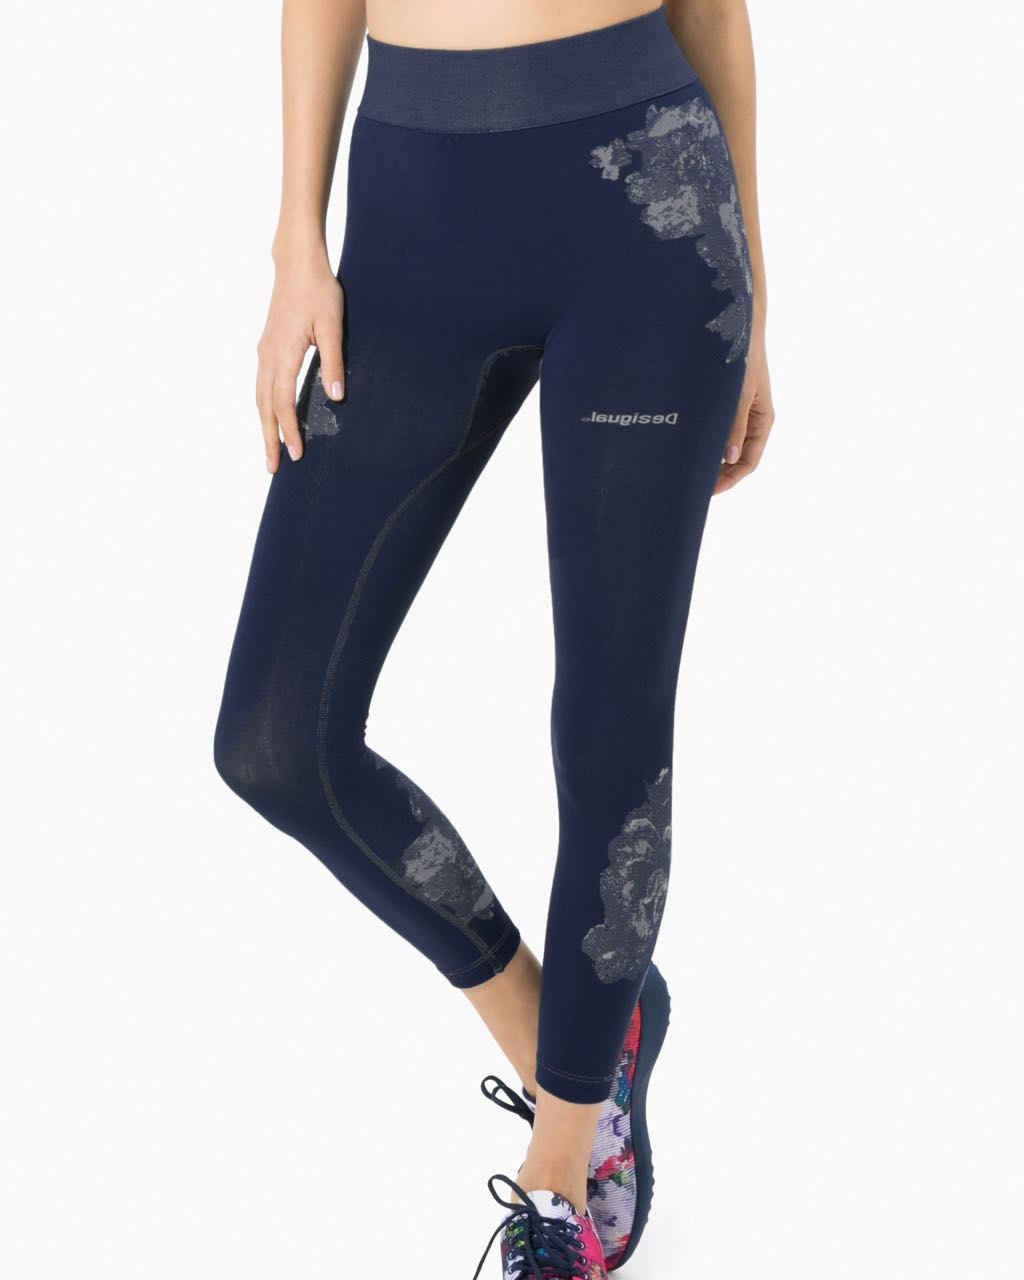 17WZRS00_3003 Desigual Run Pro Seamless Legging Buy Online